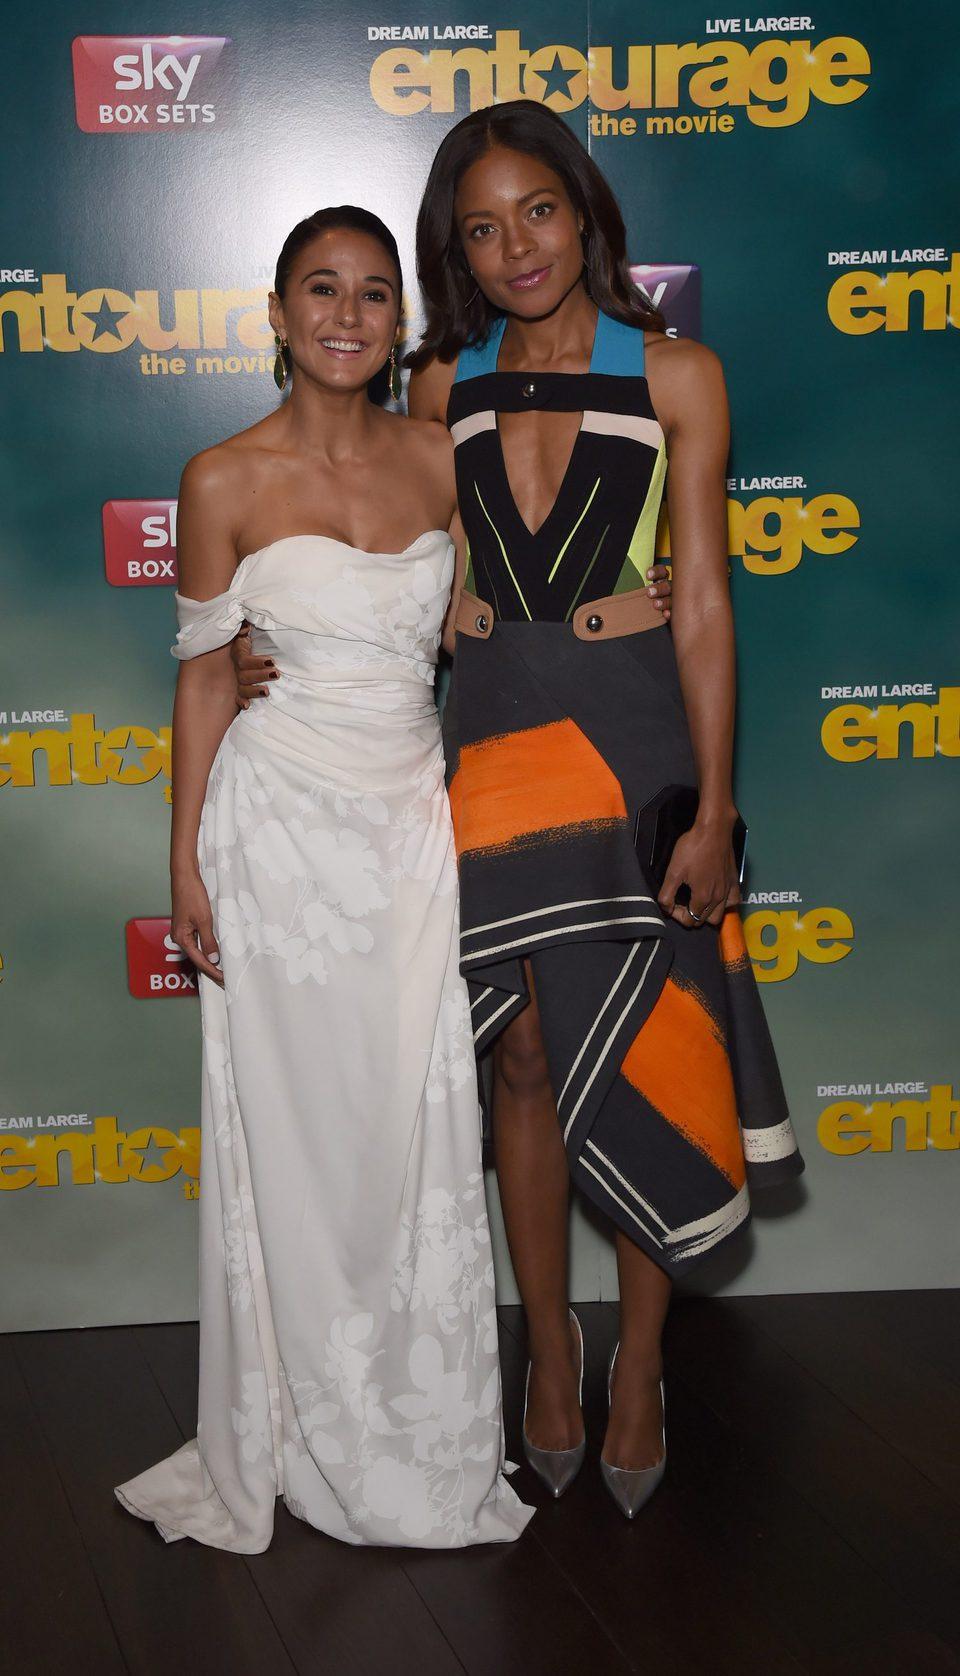 Emmanuelle Chriqui y Naomie Harris posan en la fiesta de 'Entourage'